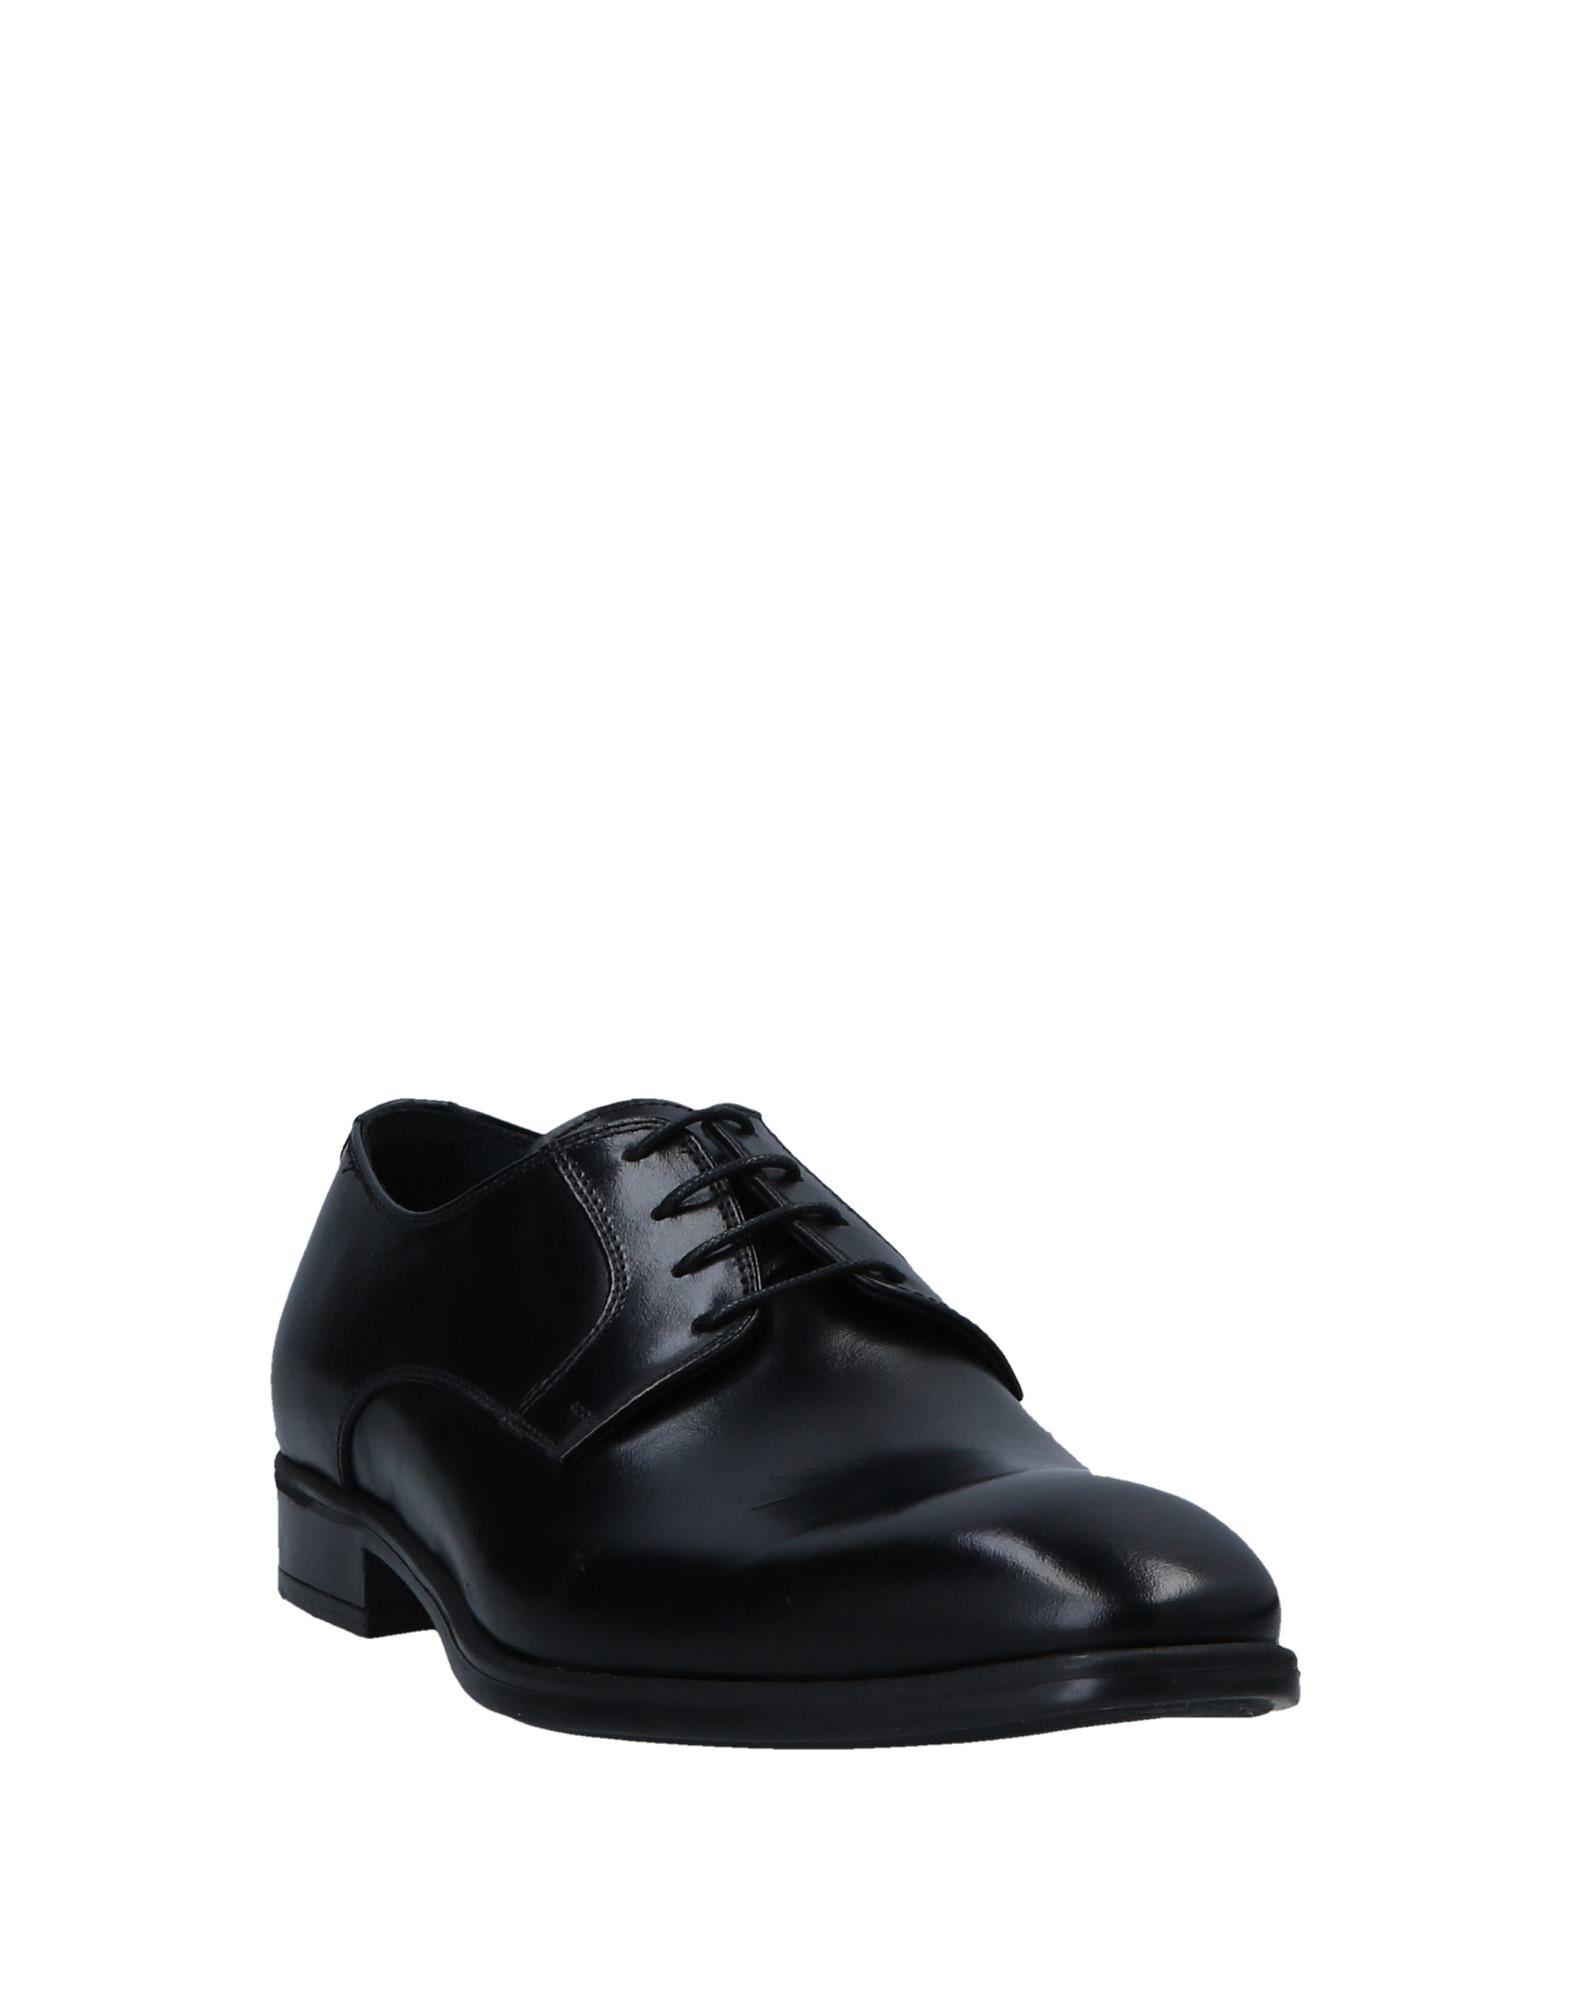 Rabatt echte Schuhe 11551082PO L&G Schnürschuhe Herren  11551082PO Schuhe b4bdbc